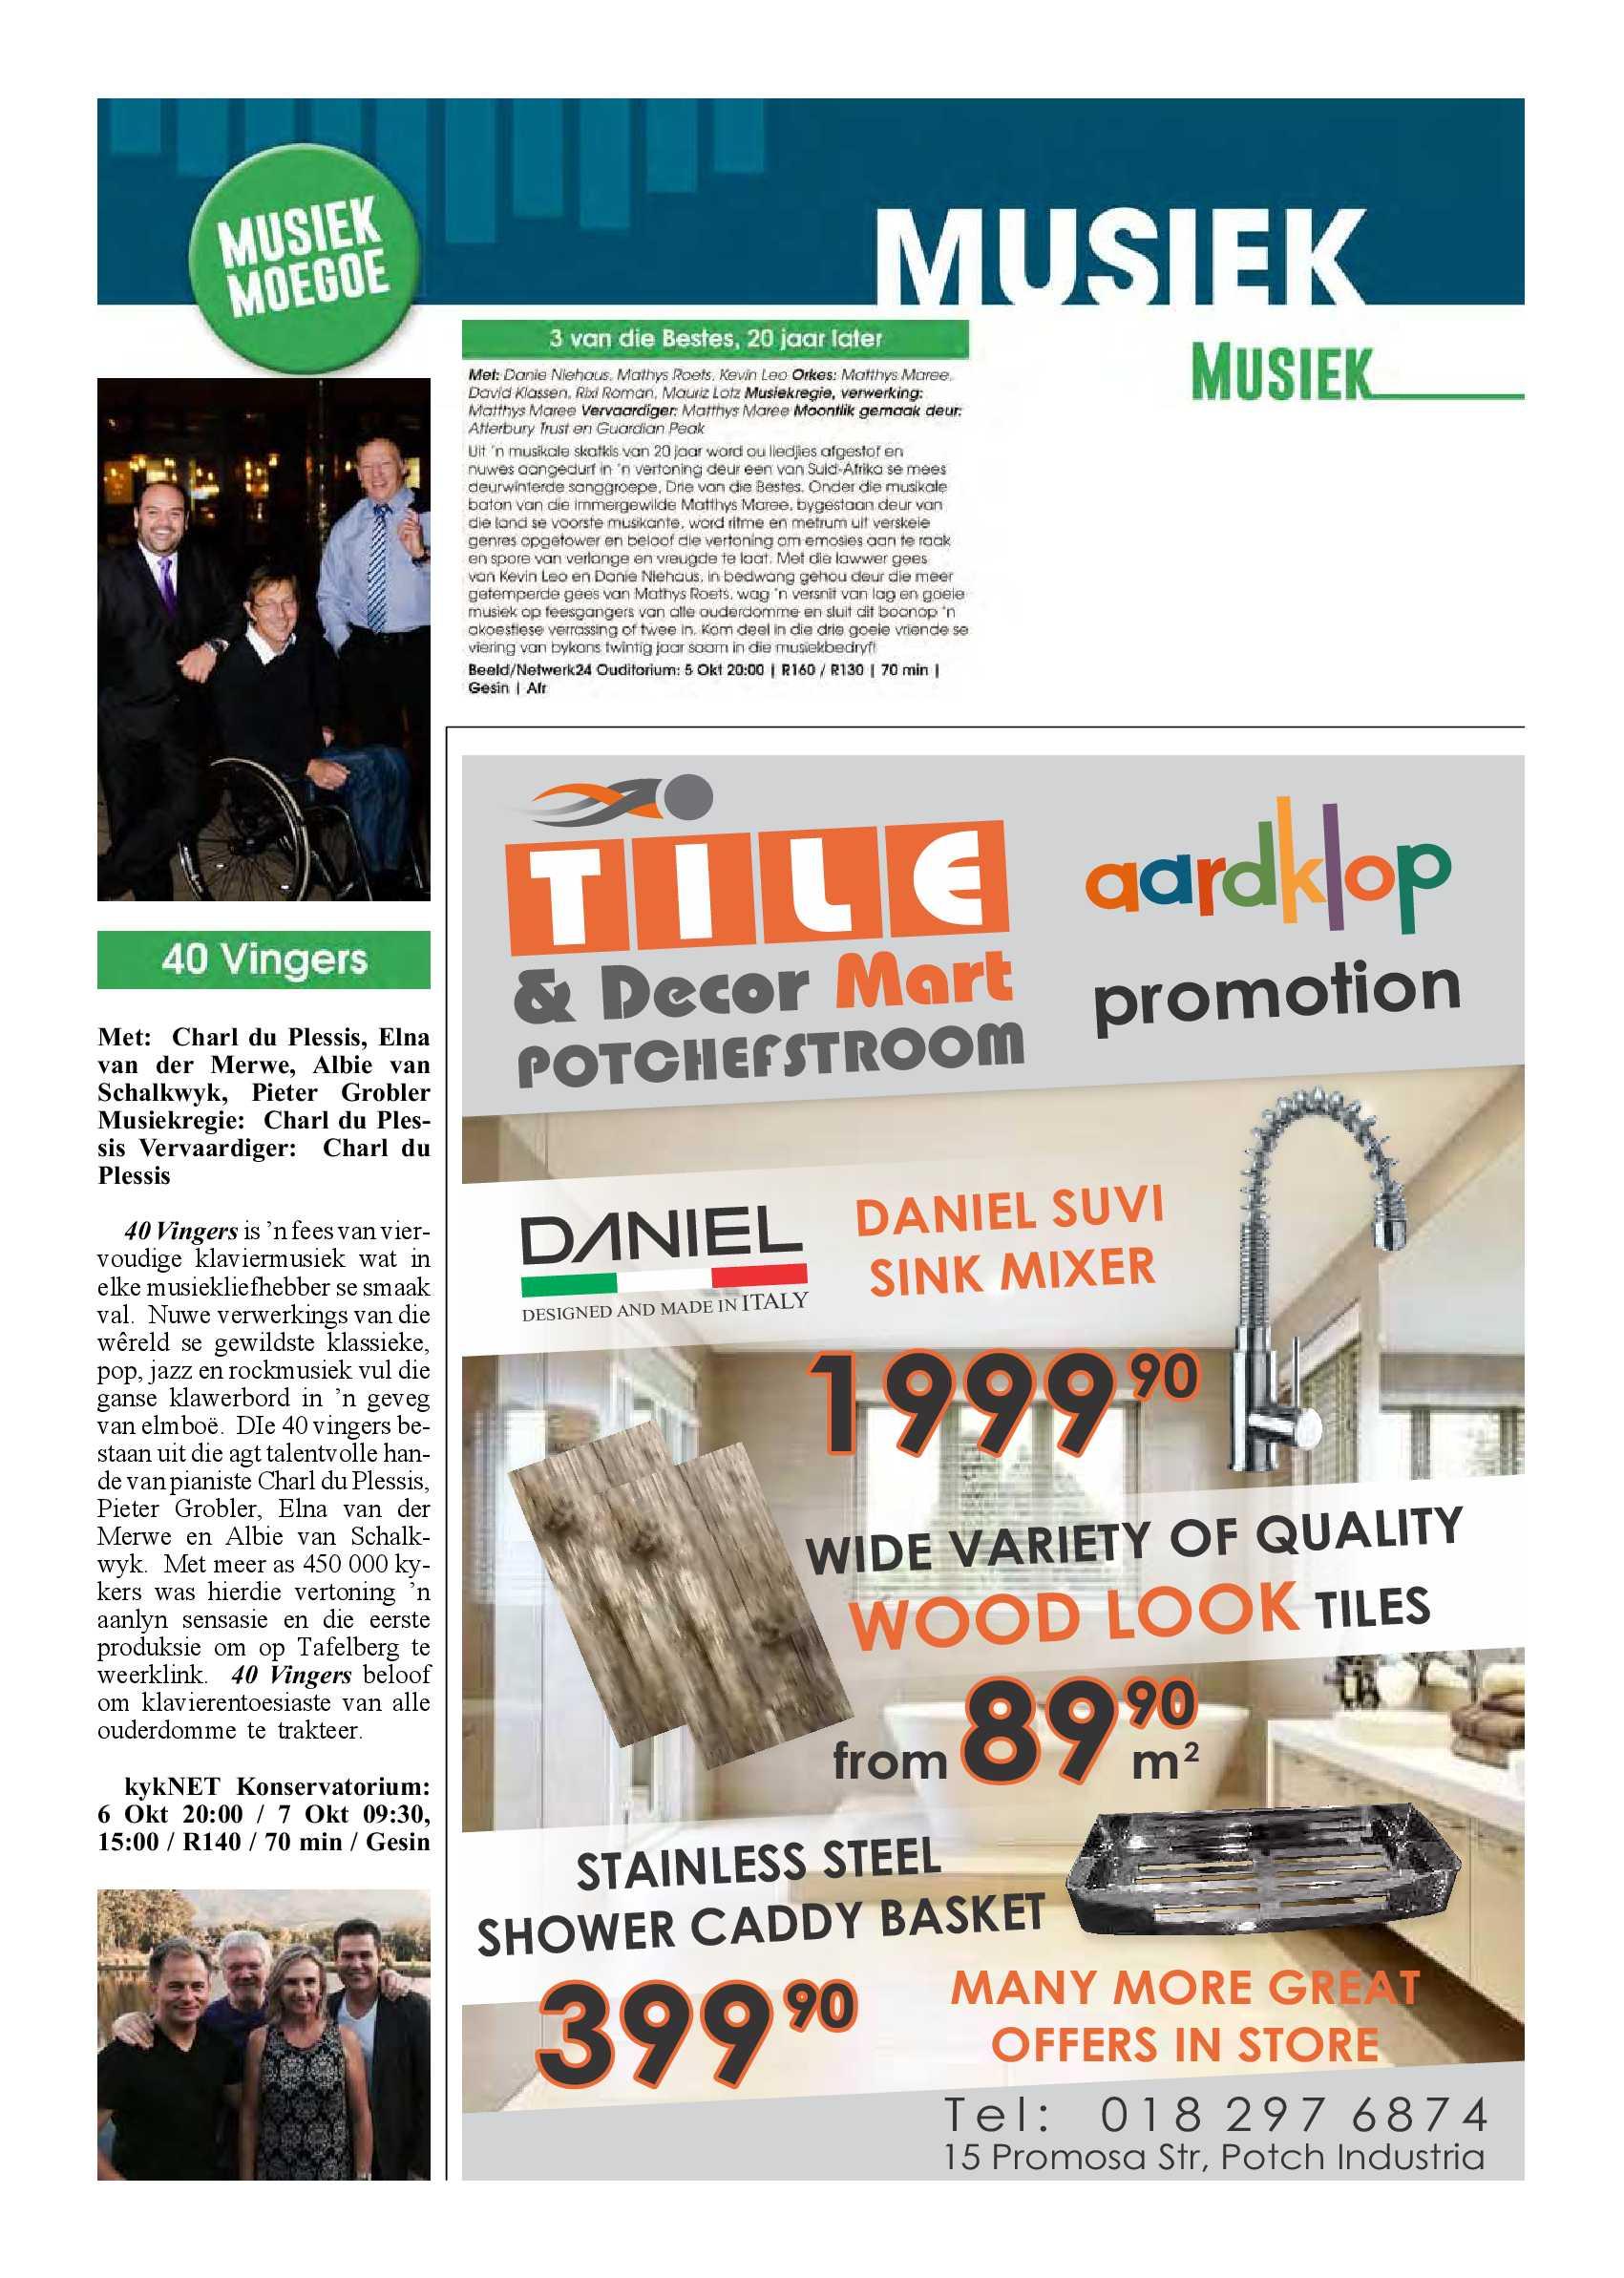 aardklop-2017-epapers-page-11